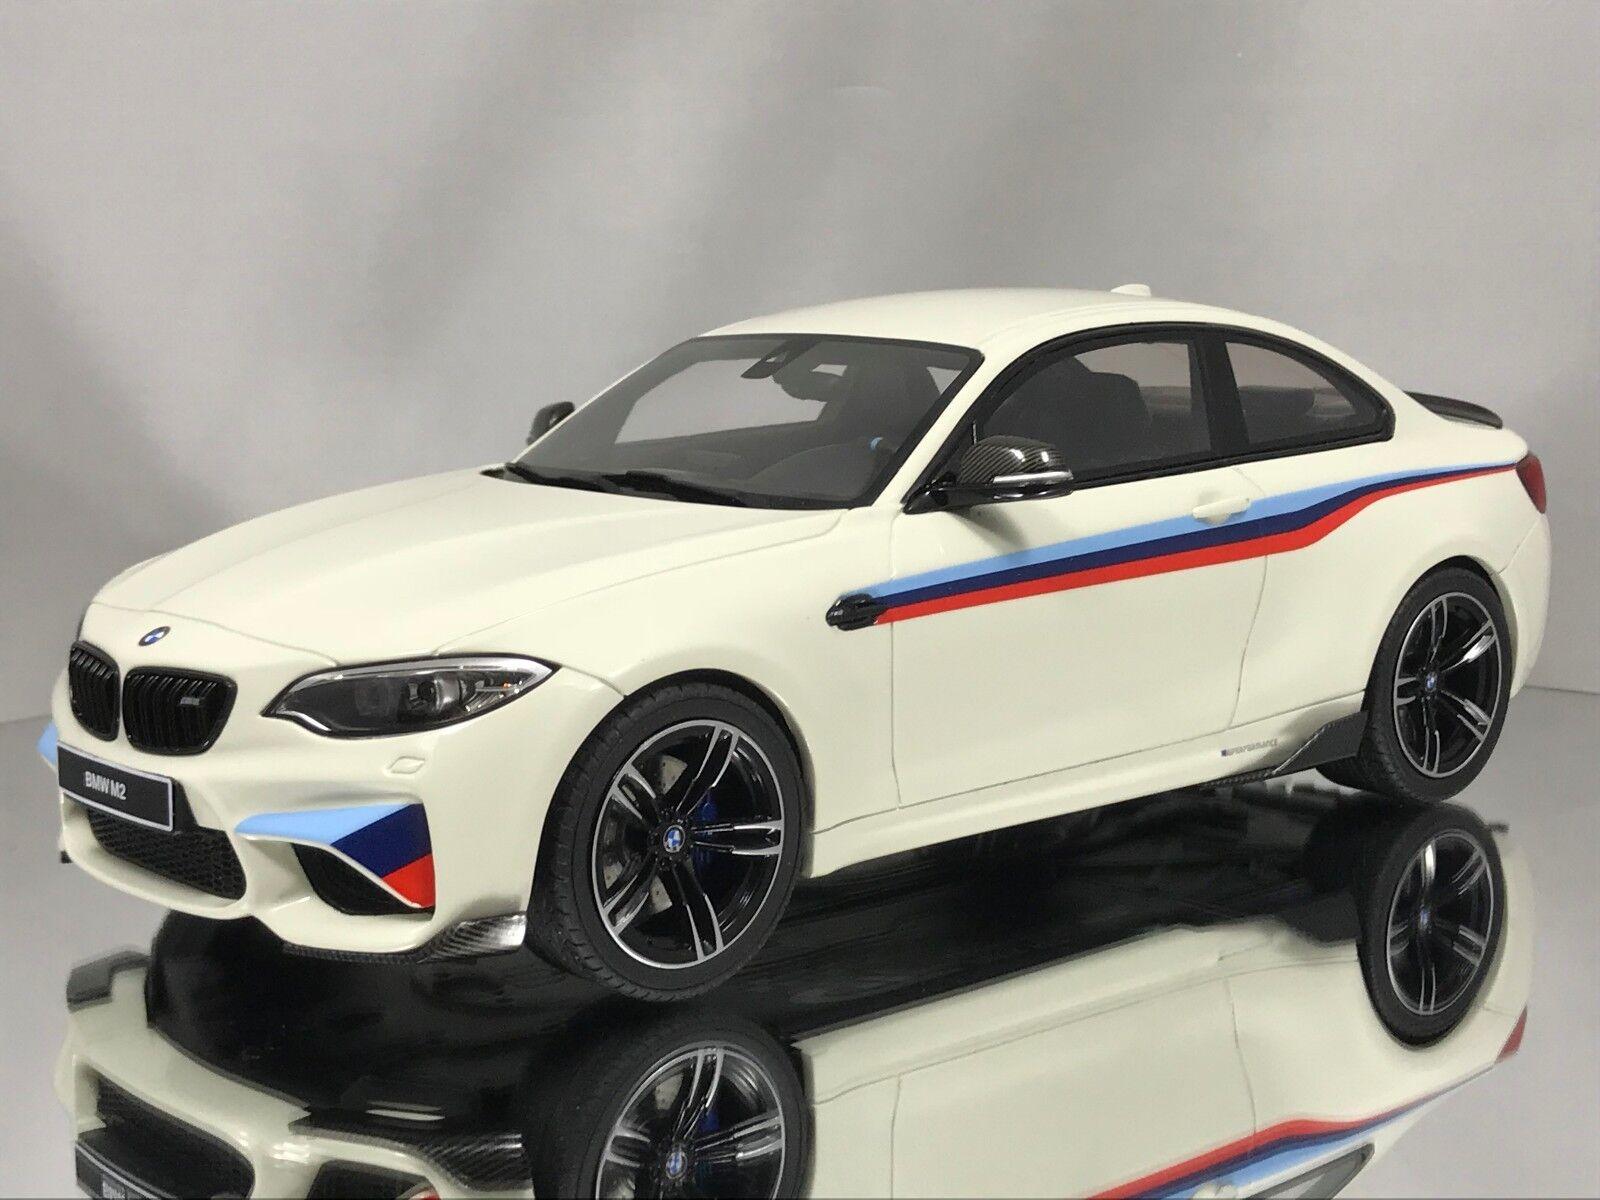 GT Spirit BMW M2 Coupe (F22) 2 Series biancao Con M SRIPES Resina Coche Modelo 1 18